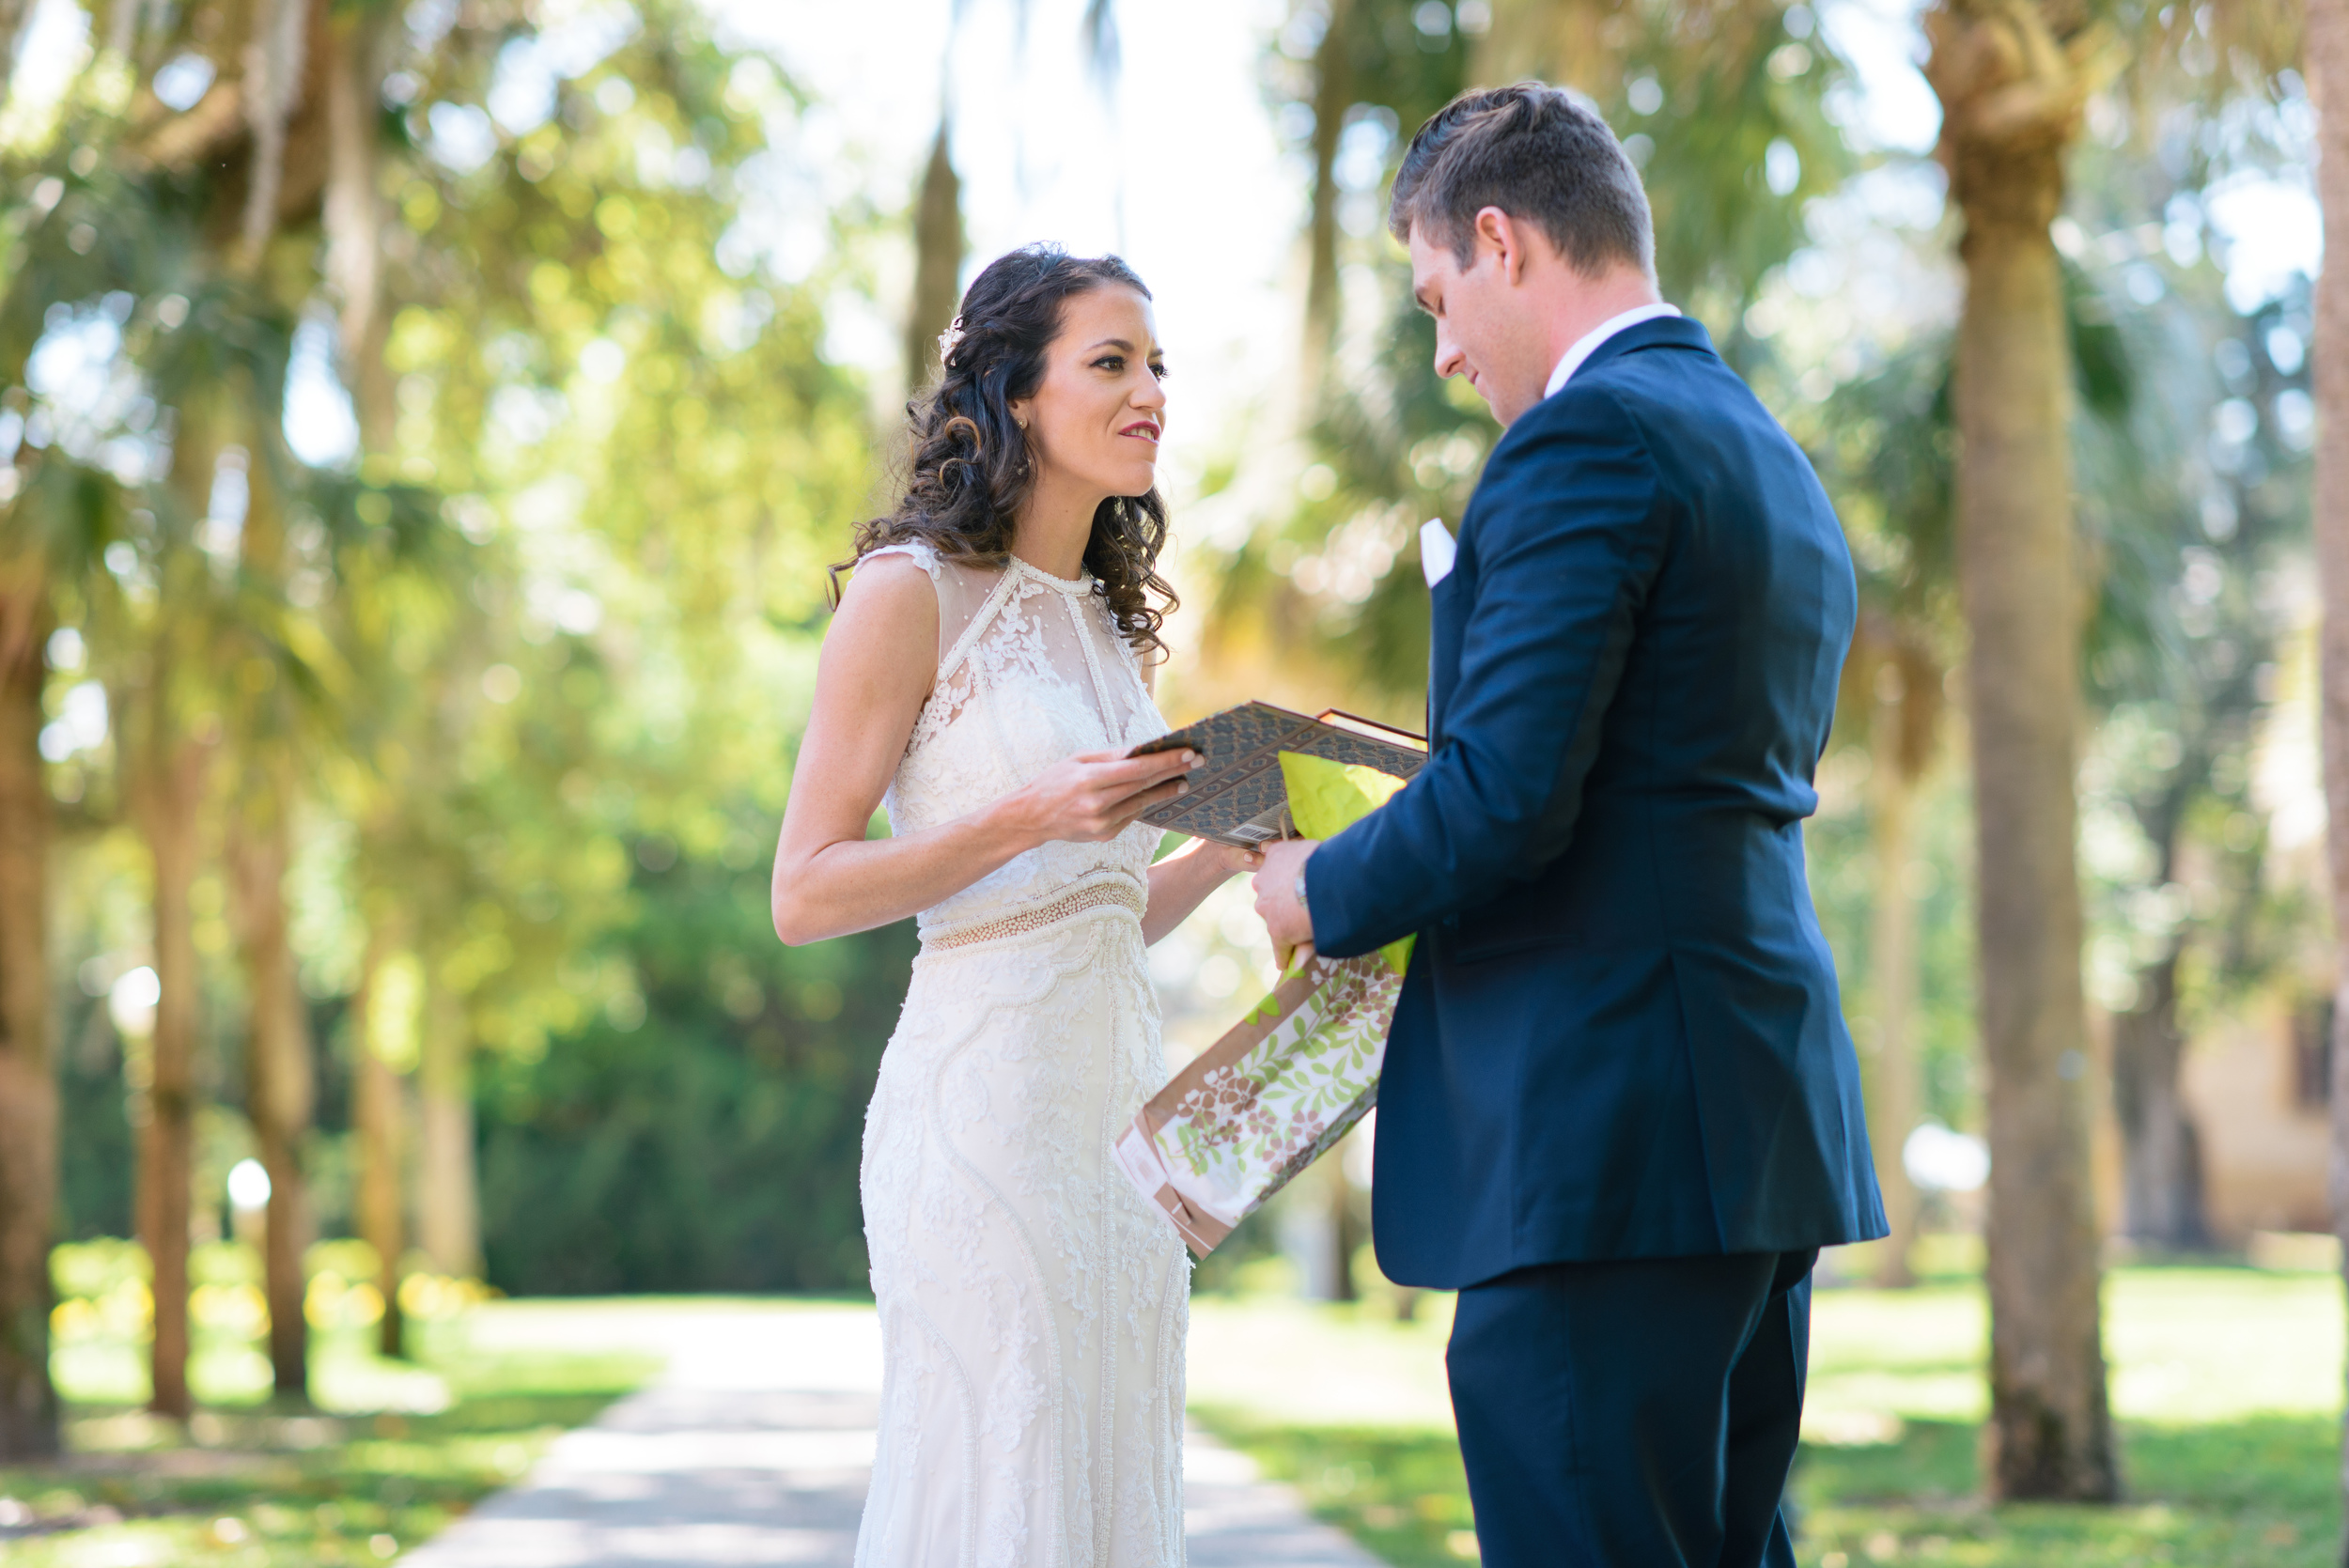 kadi-and-matt-carroll-april-9-2016-jekyl-island-wedding-m-newsom-photography- (221 of 744).jpg